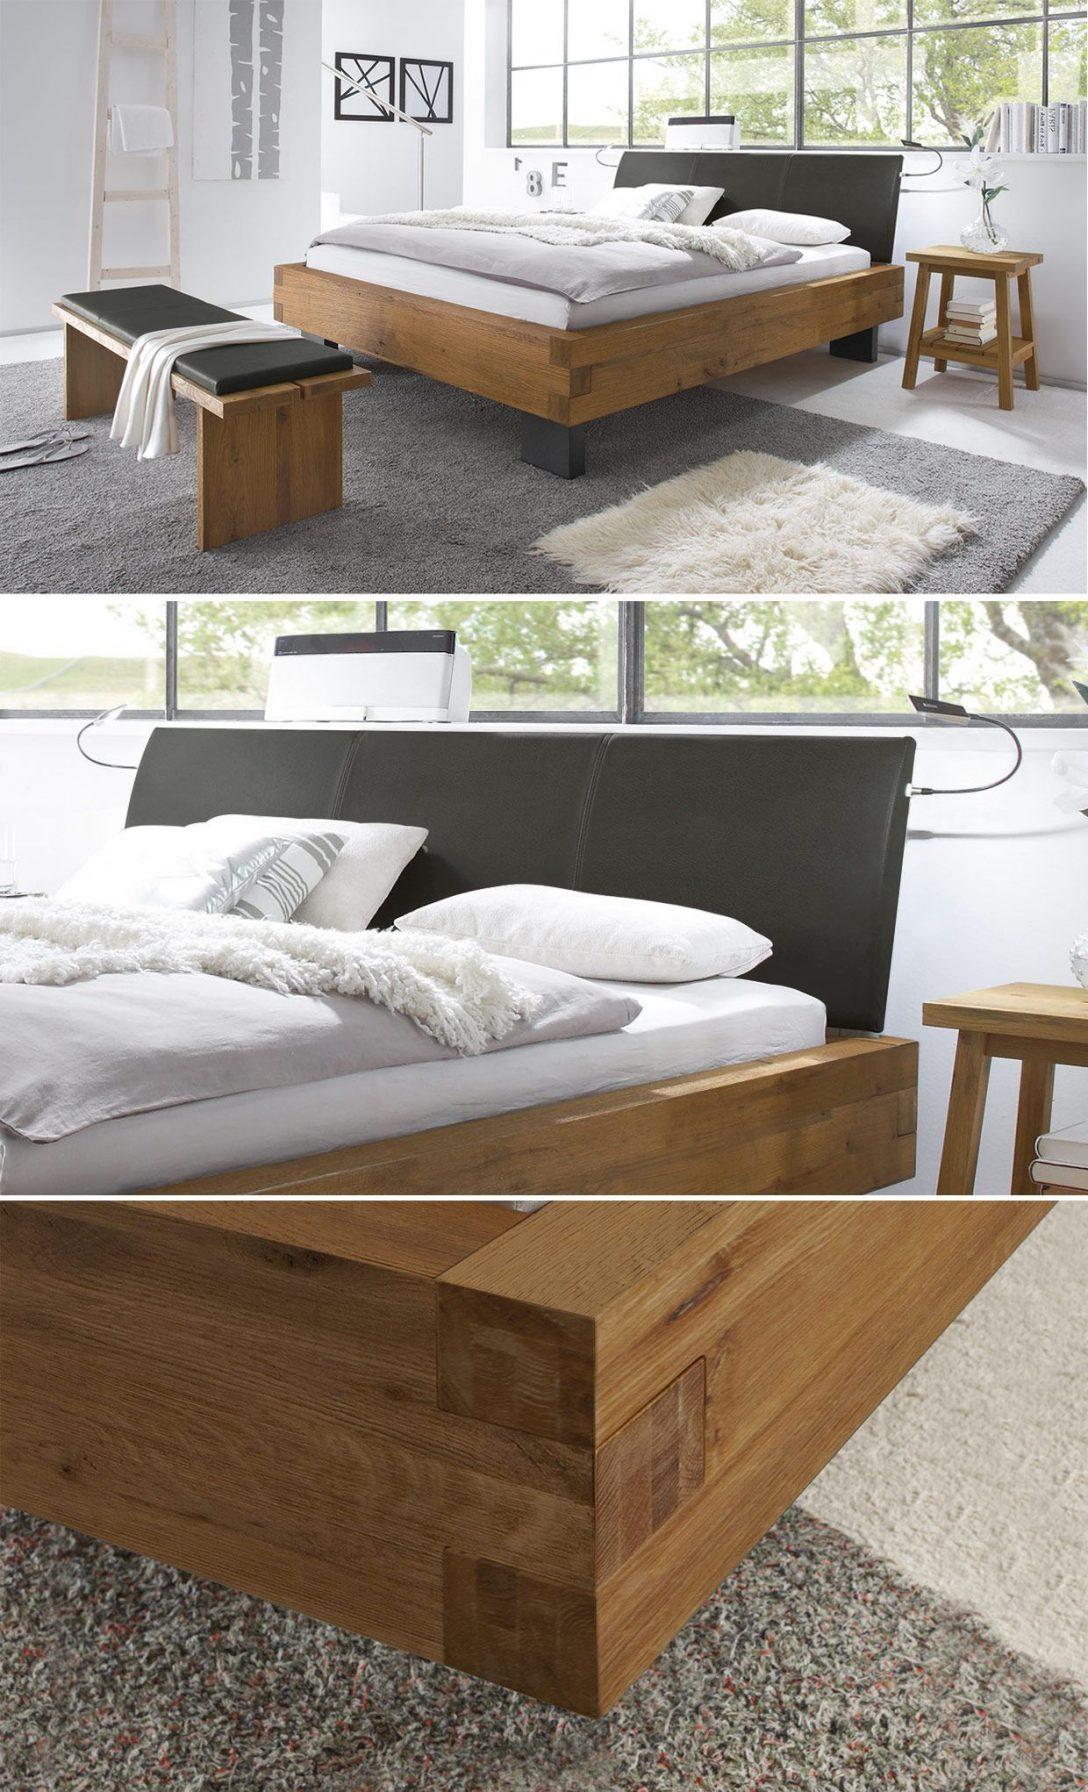 Large Size of Bett Modern 140x200 Beyond Better Sleep Pillow Eiche Design Holz Betten 120x200 Leader Kaufen 180x200 Italienisches Puristisch Günstig Bette Duschwanne Ruf Wohnzimmer Bett Modern